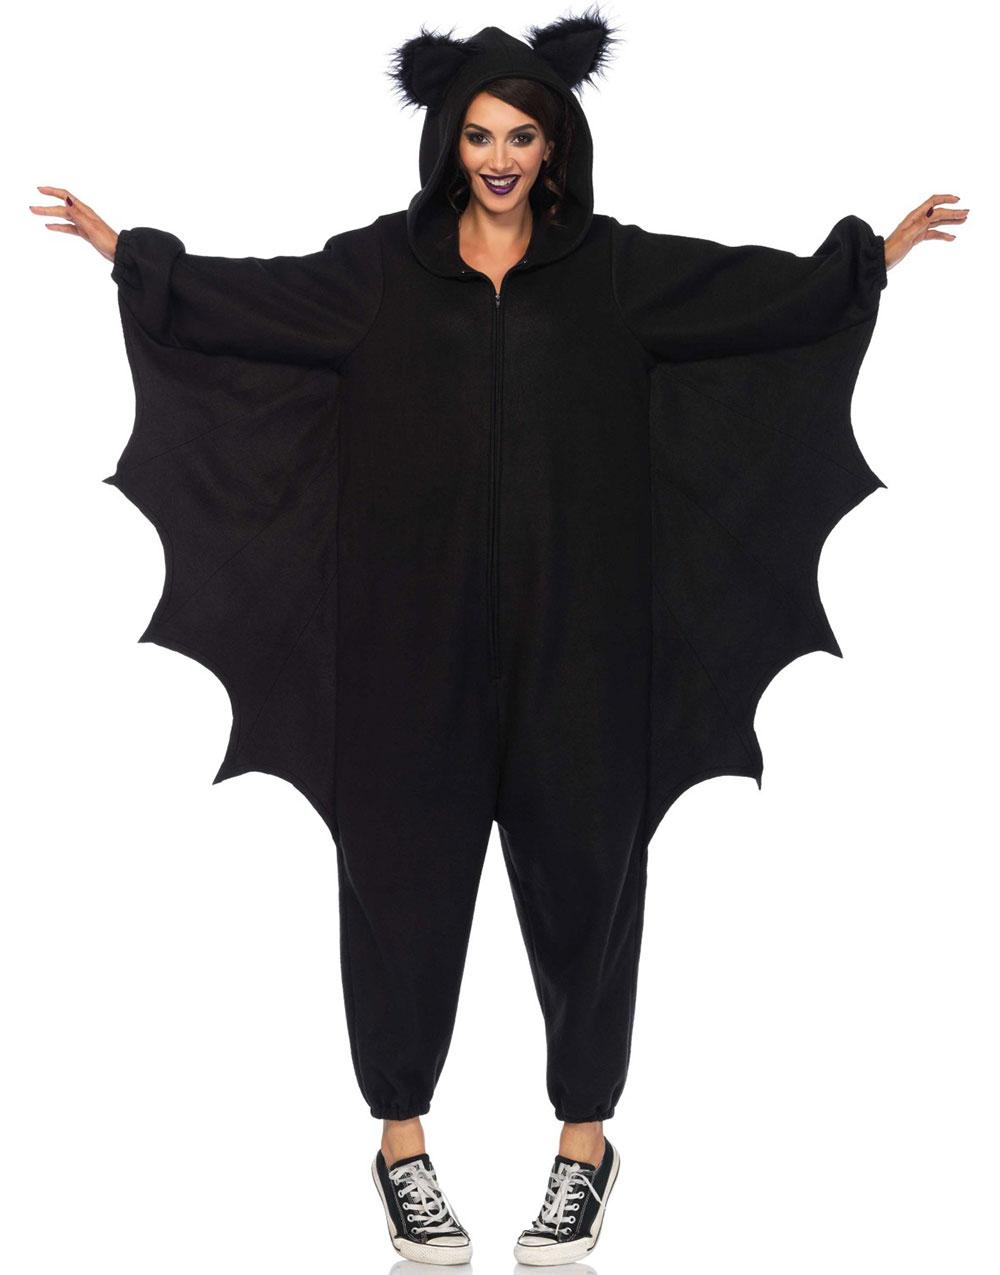 Kigurumi Bat - Kostym